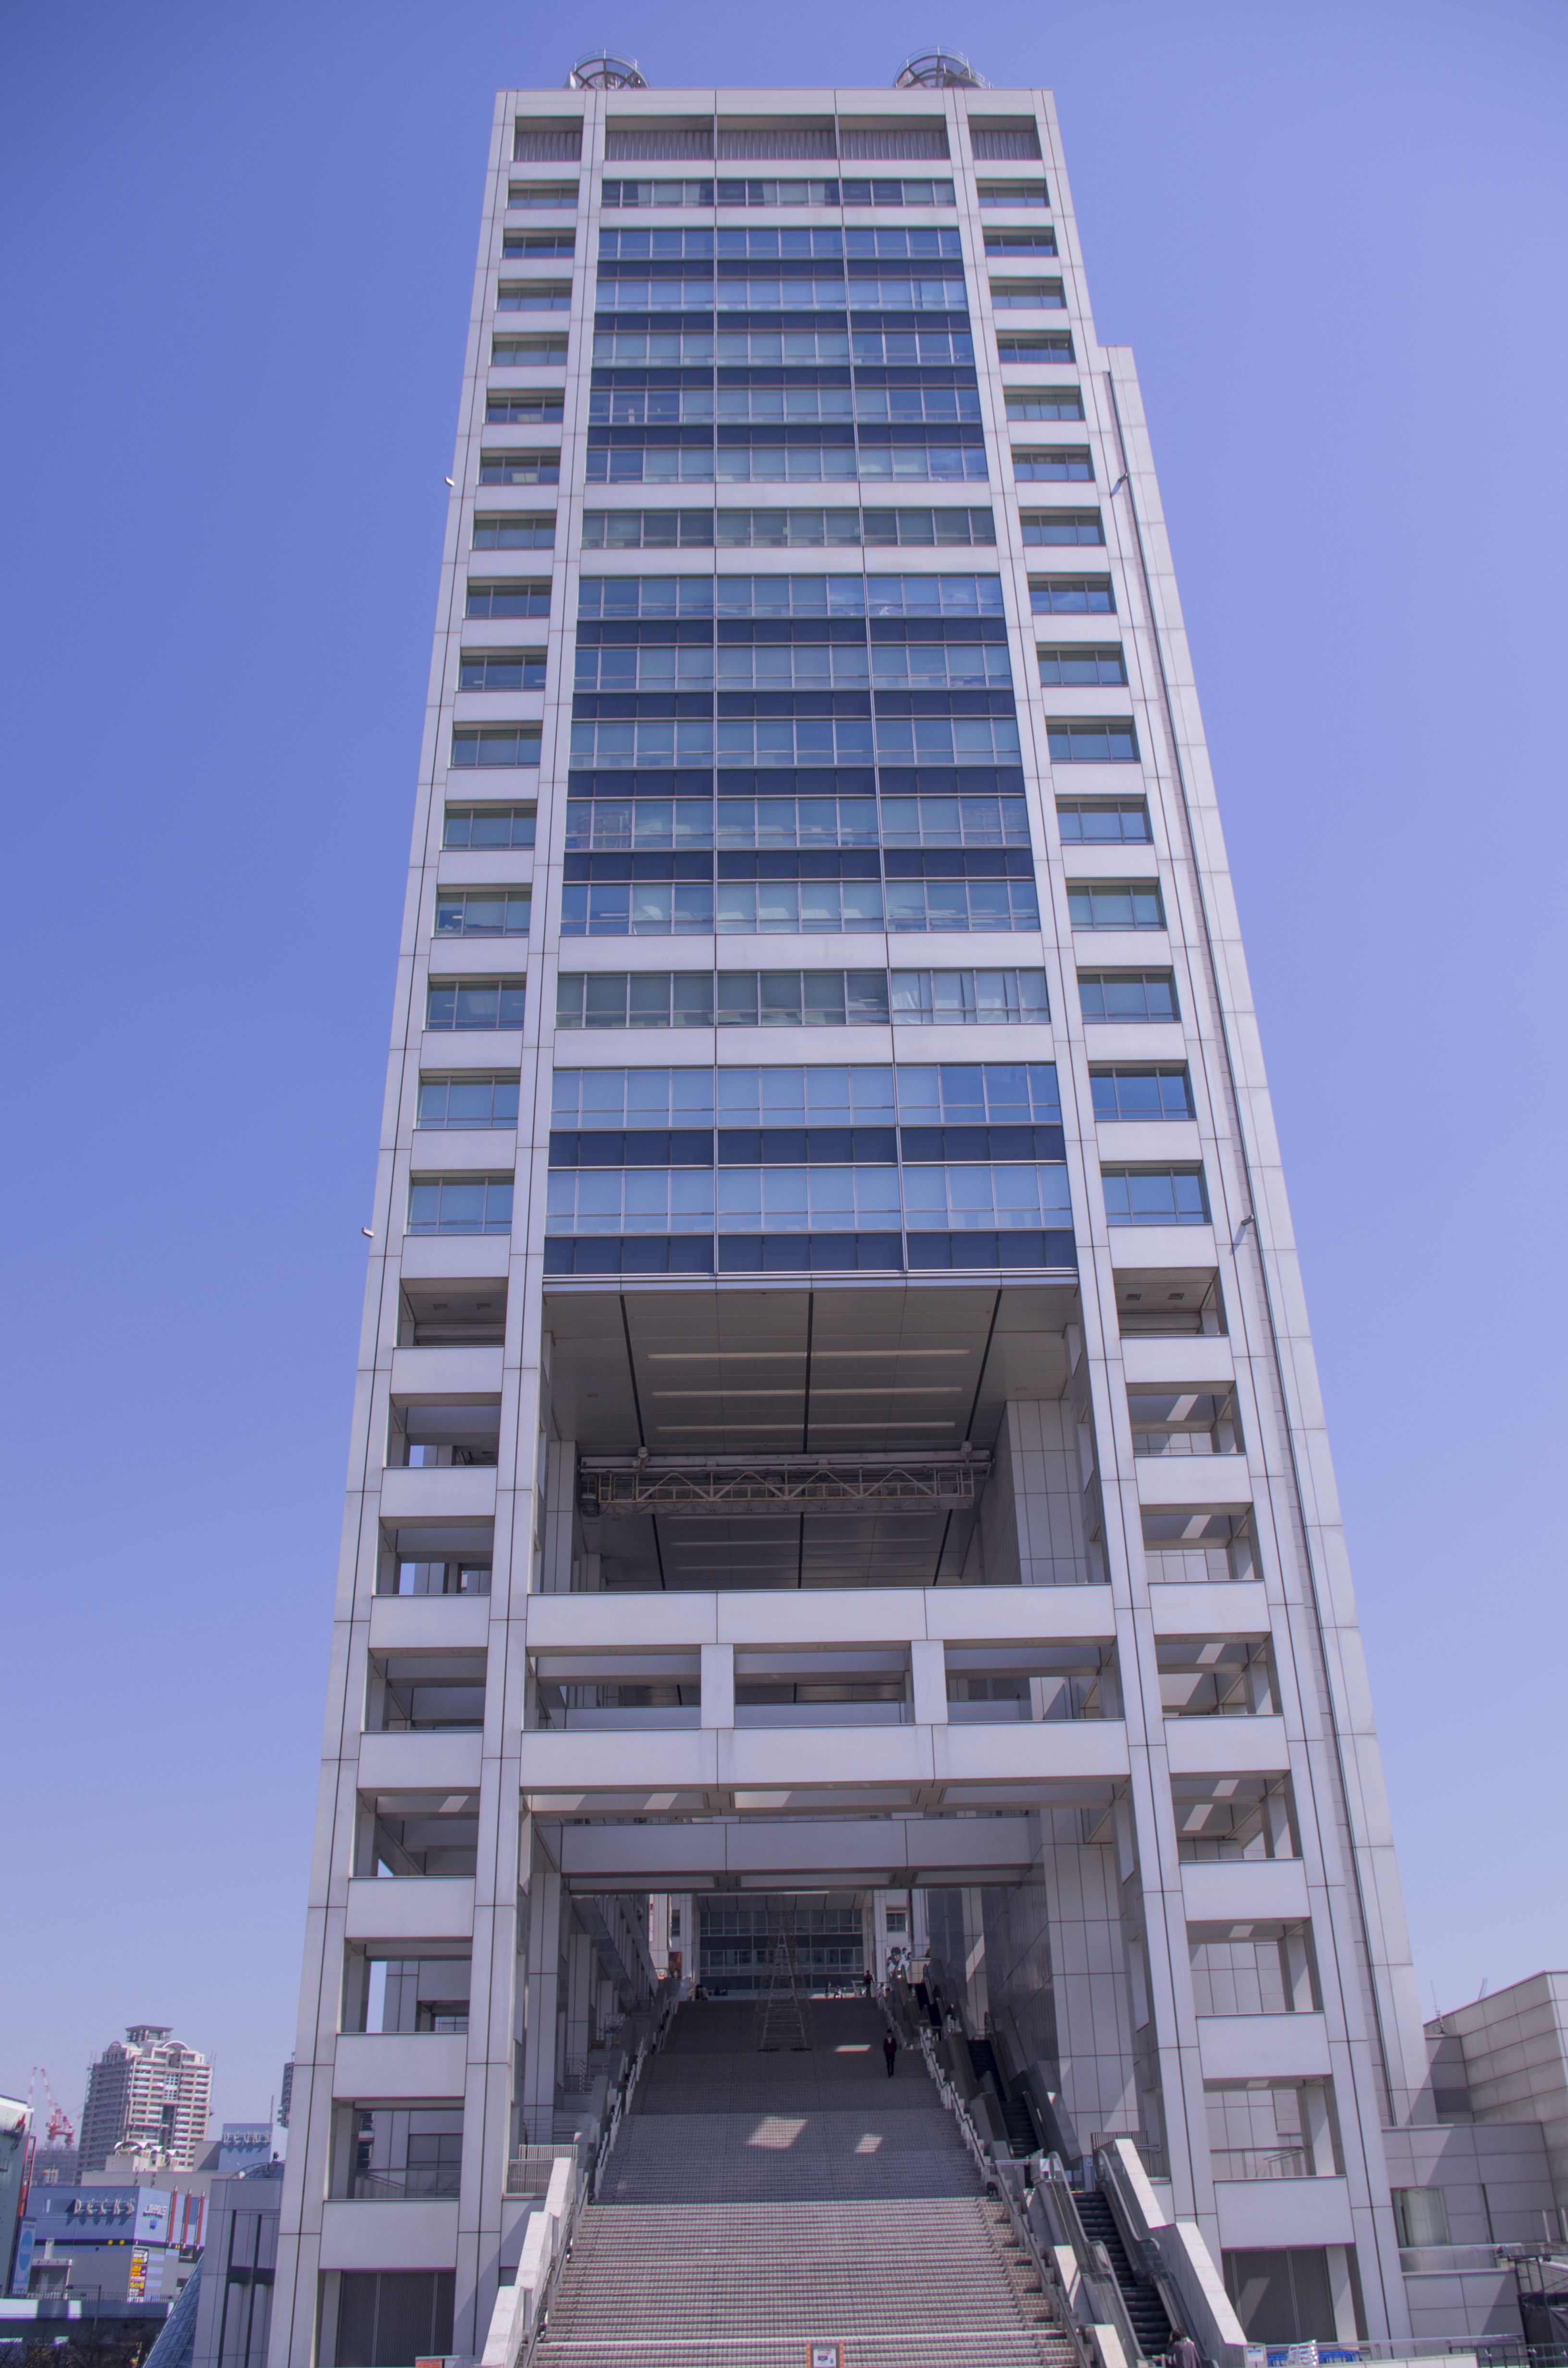 Side entrance to Fuji TV building